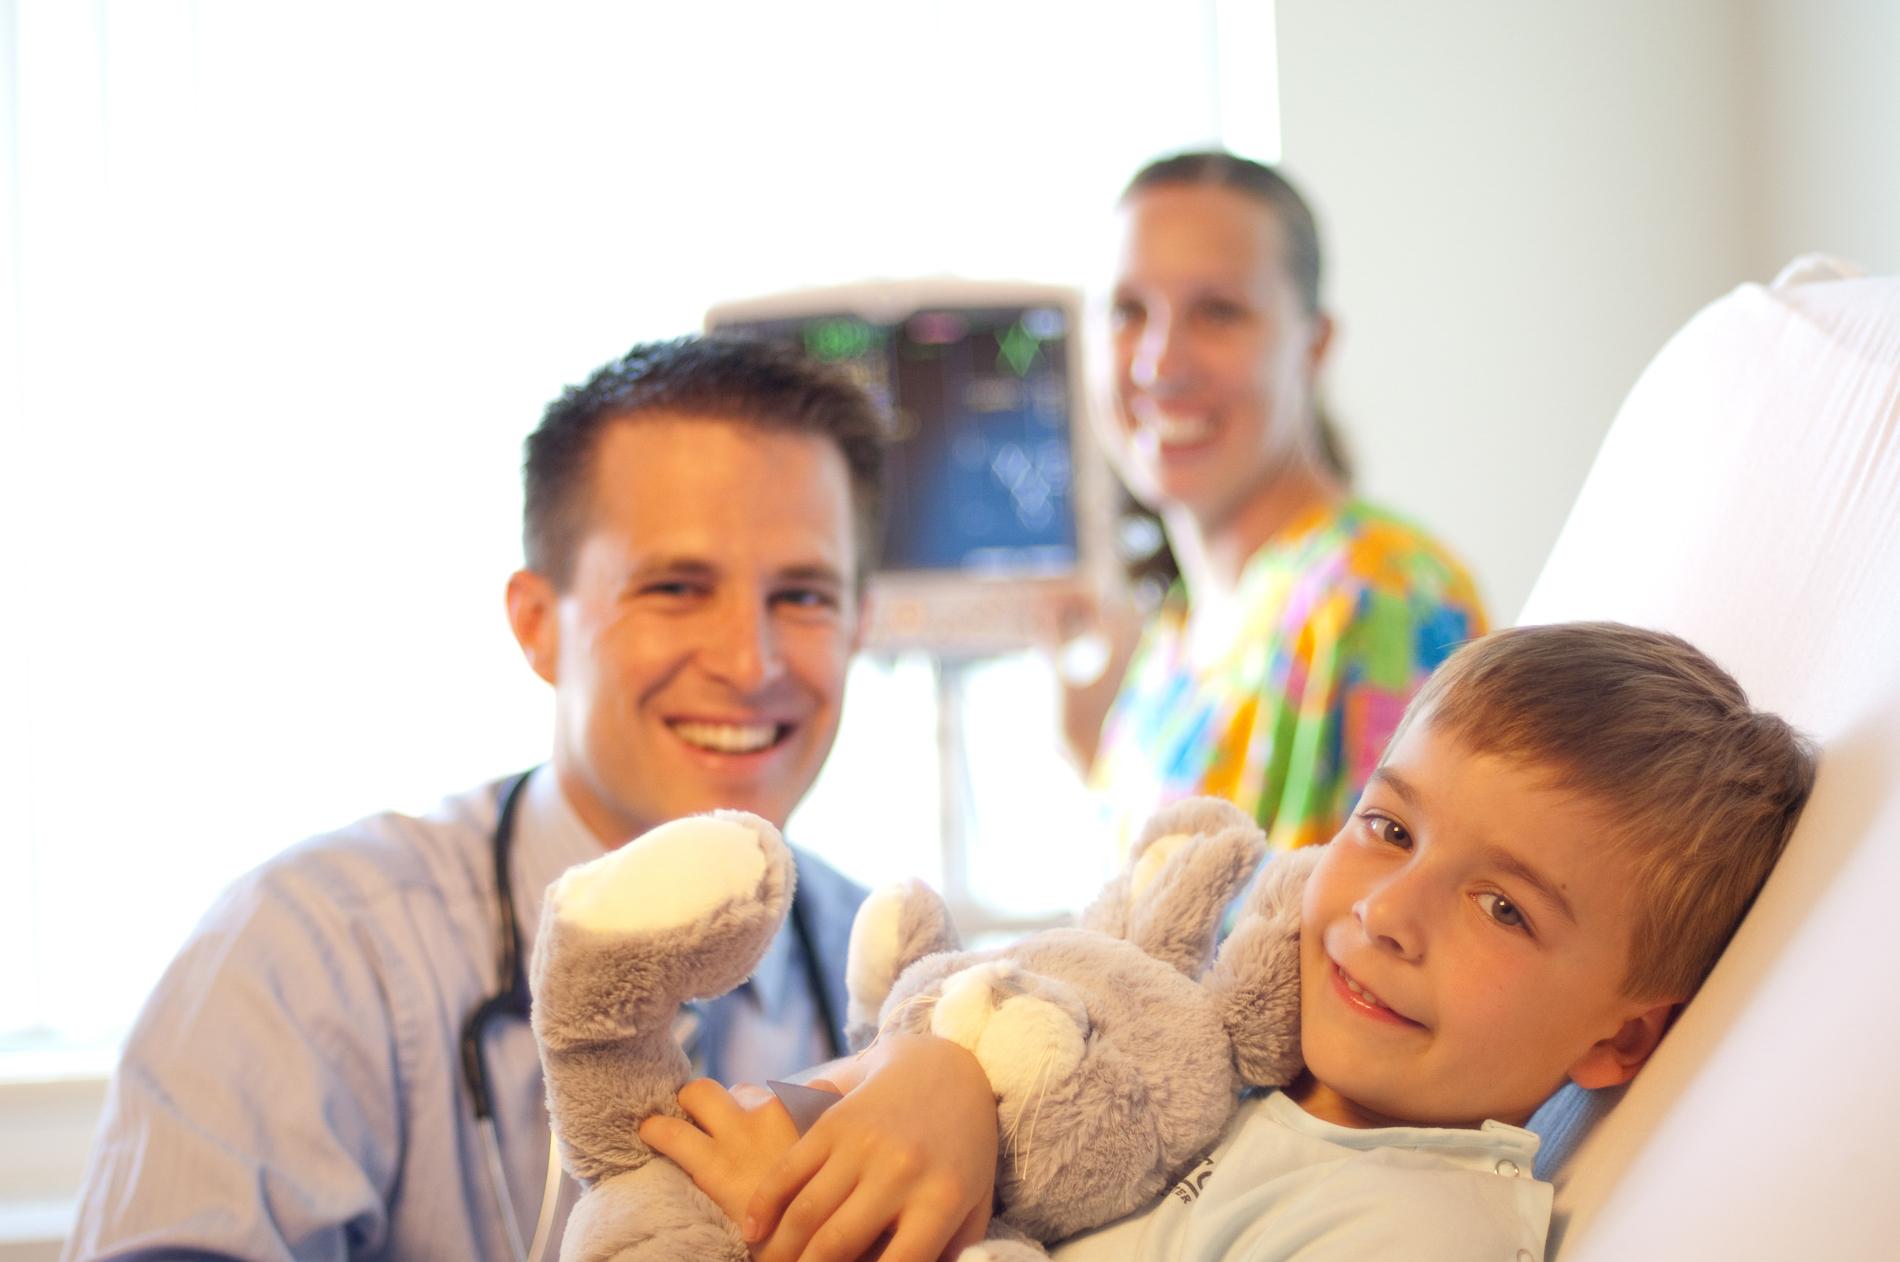 Pediatric Department Photography